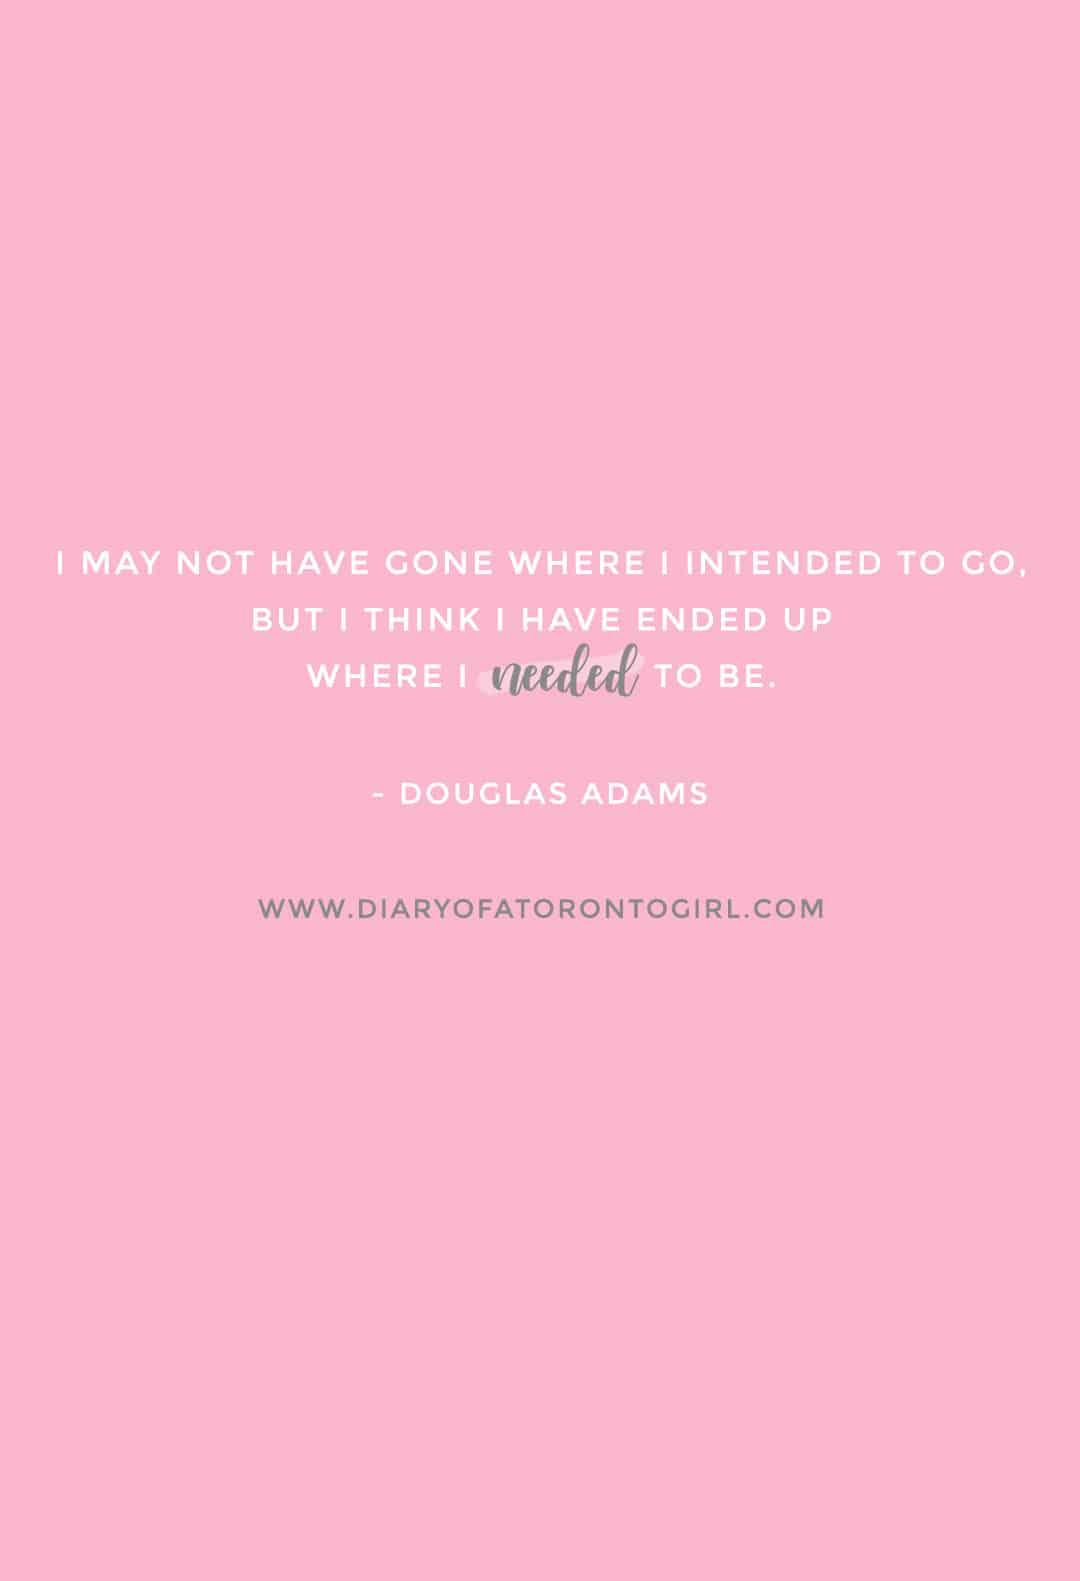 Douglas Adams inspirational quote